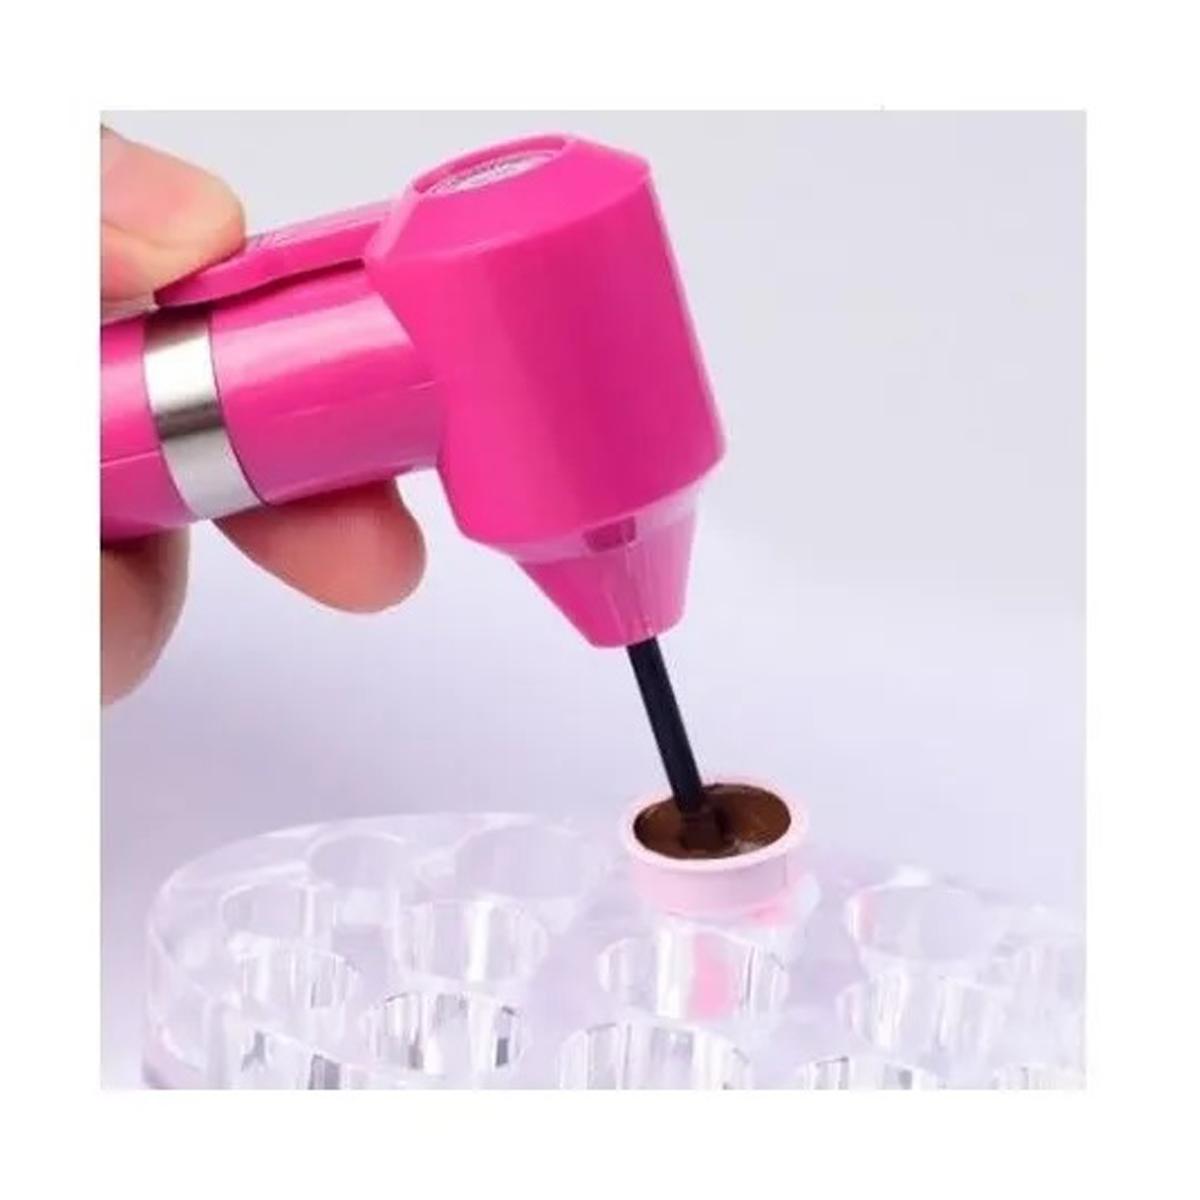 Mixer Mini Misturador Rosa Pigmentos Henna Microblading Tatuagem